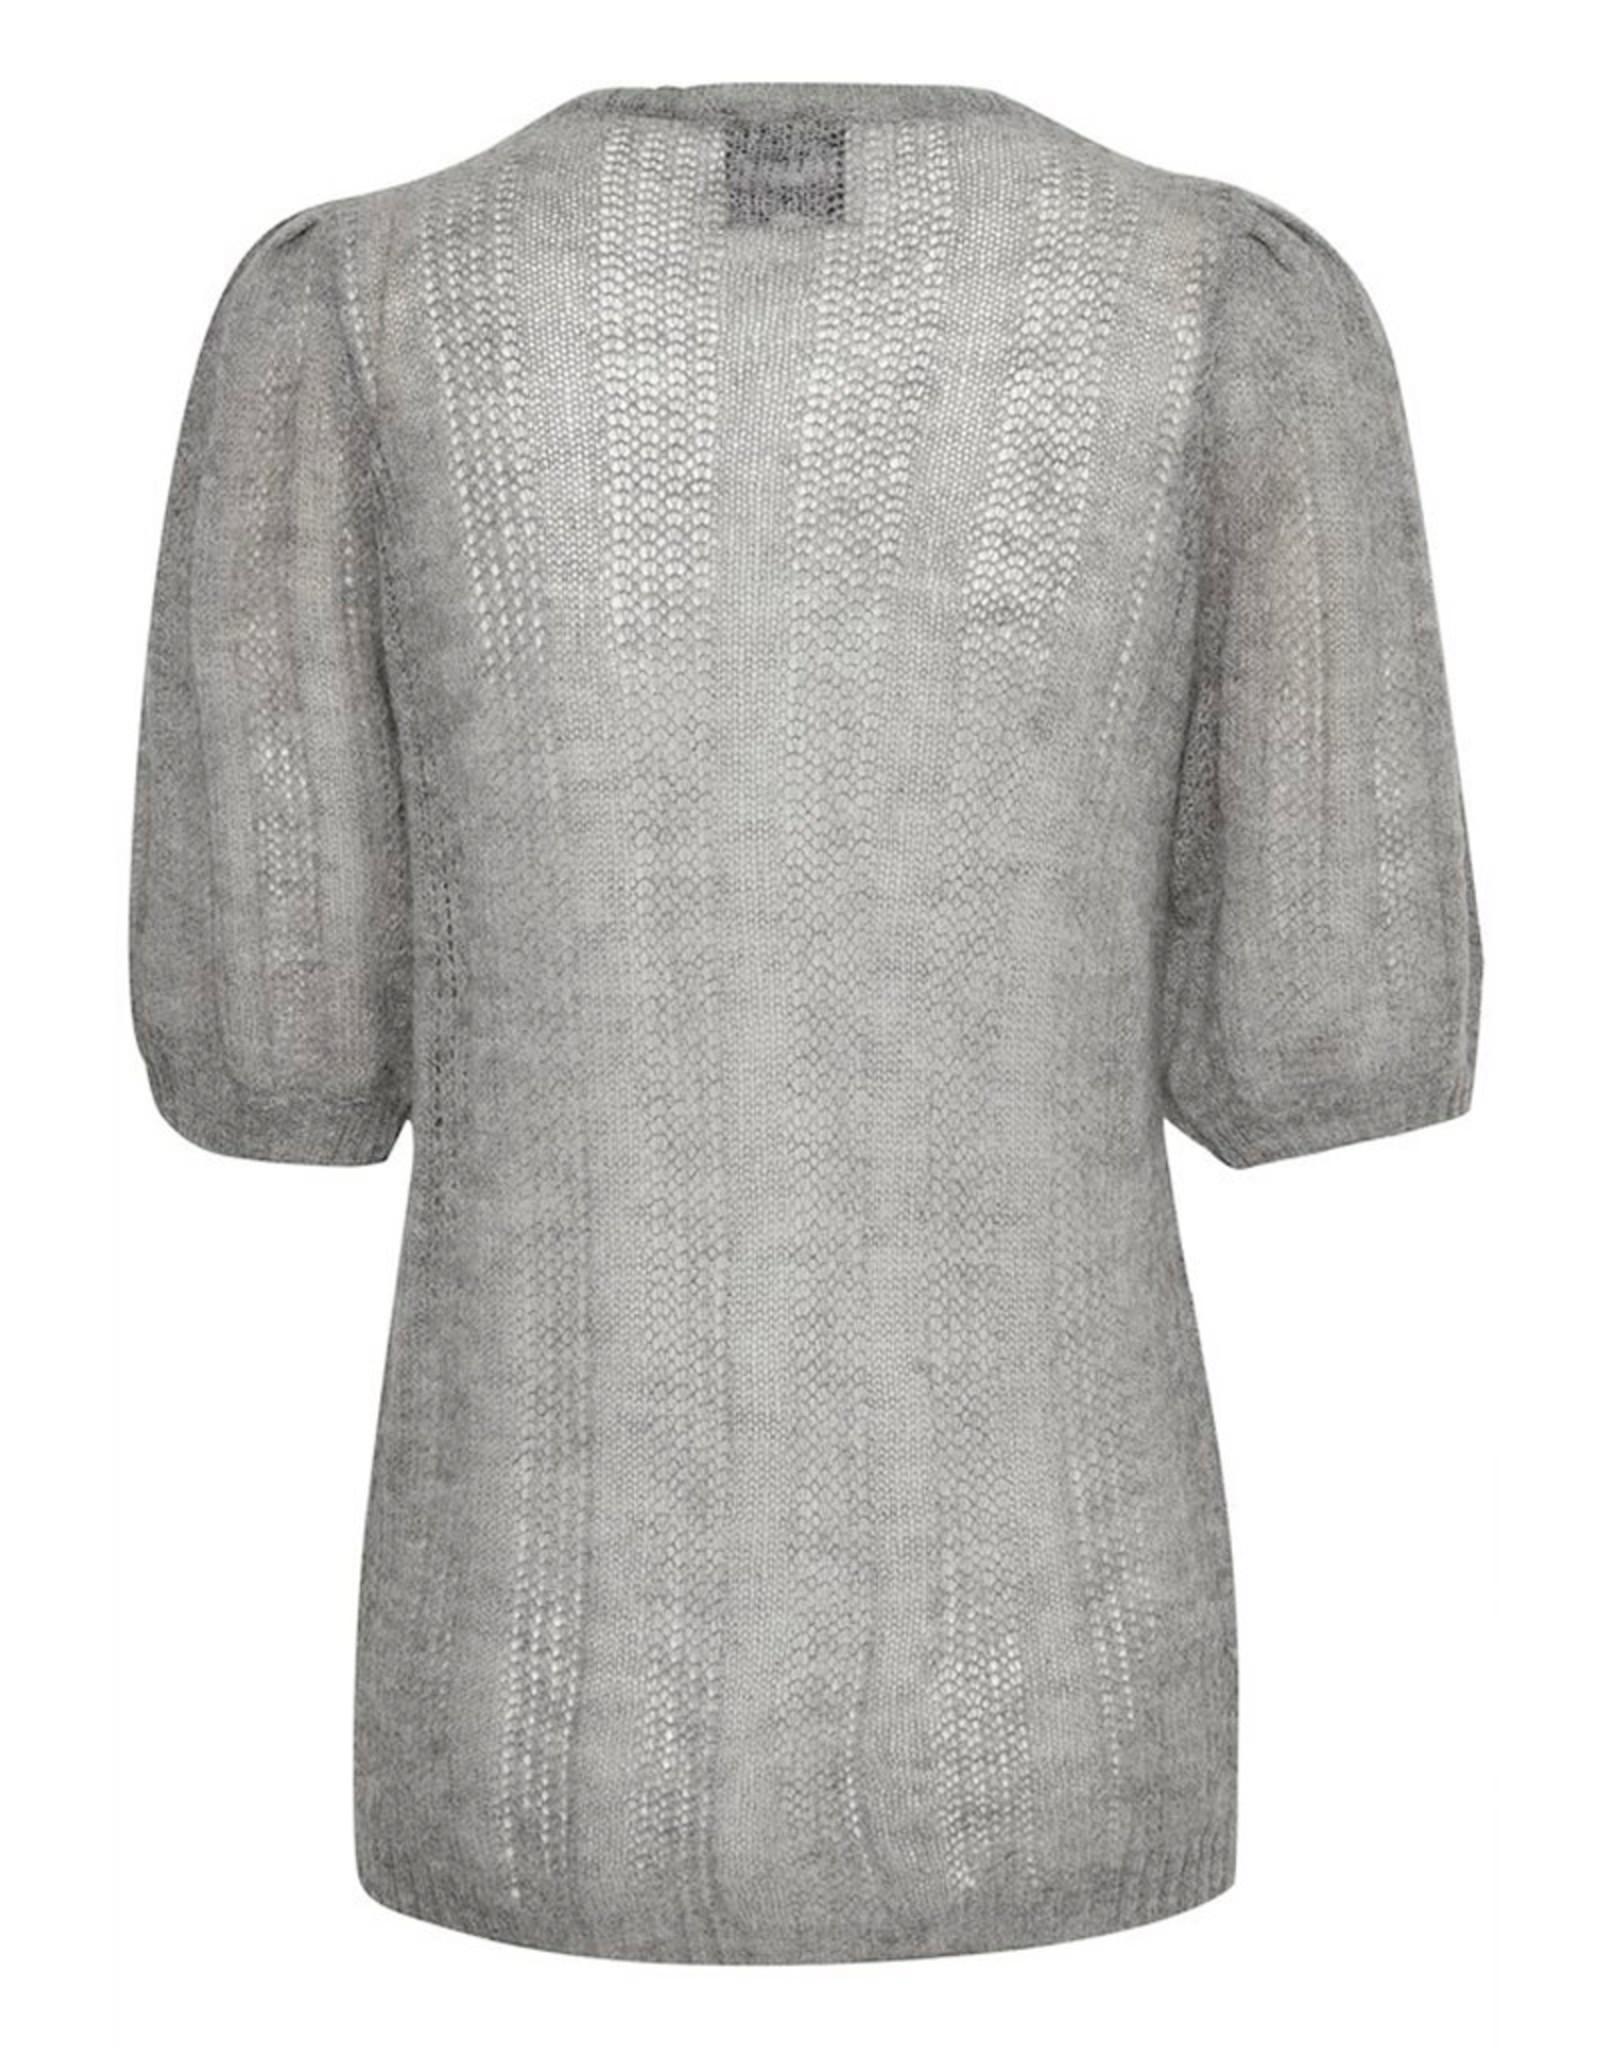 My Essential Wardrobe Fiona Knit Puff Blouse